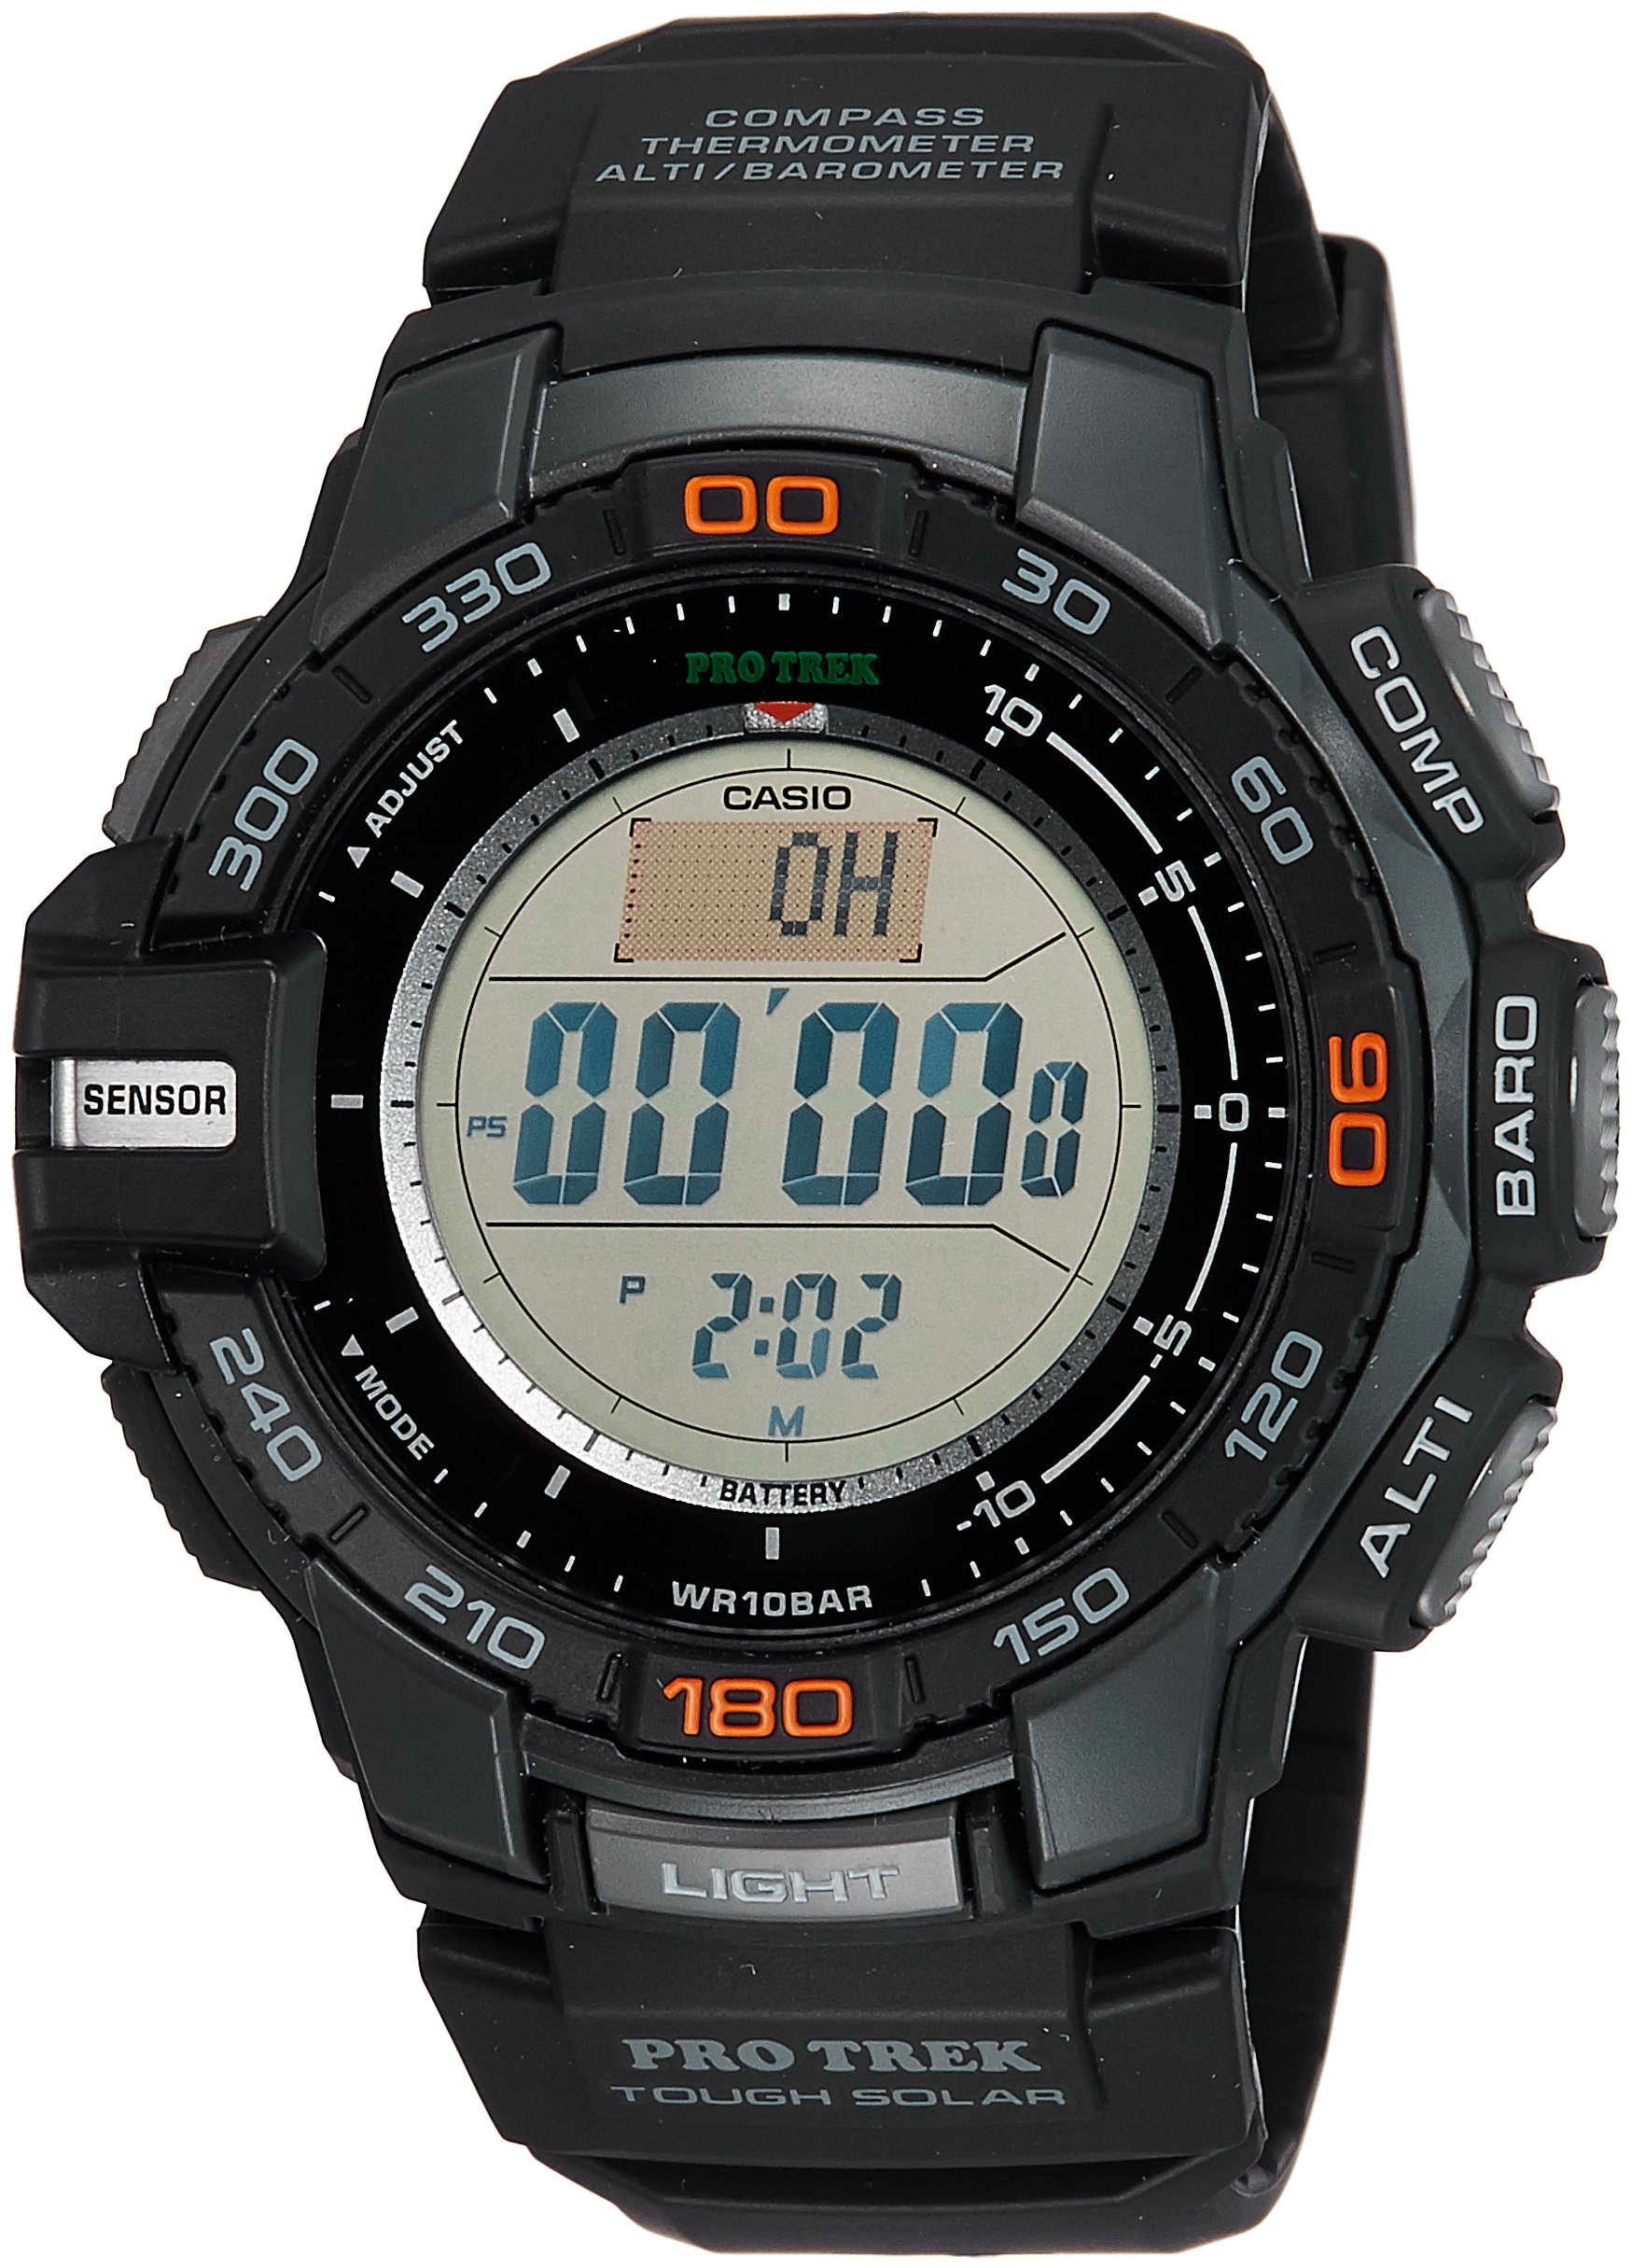 Casio Men's Pro Trek PRG-270-1 Tough Solar Triple Sensor Multifunction Digital Sport Watch by Casio (Image #1)